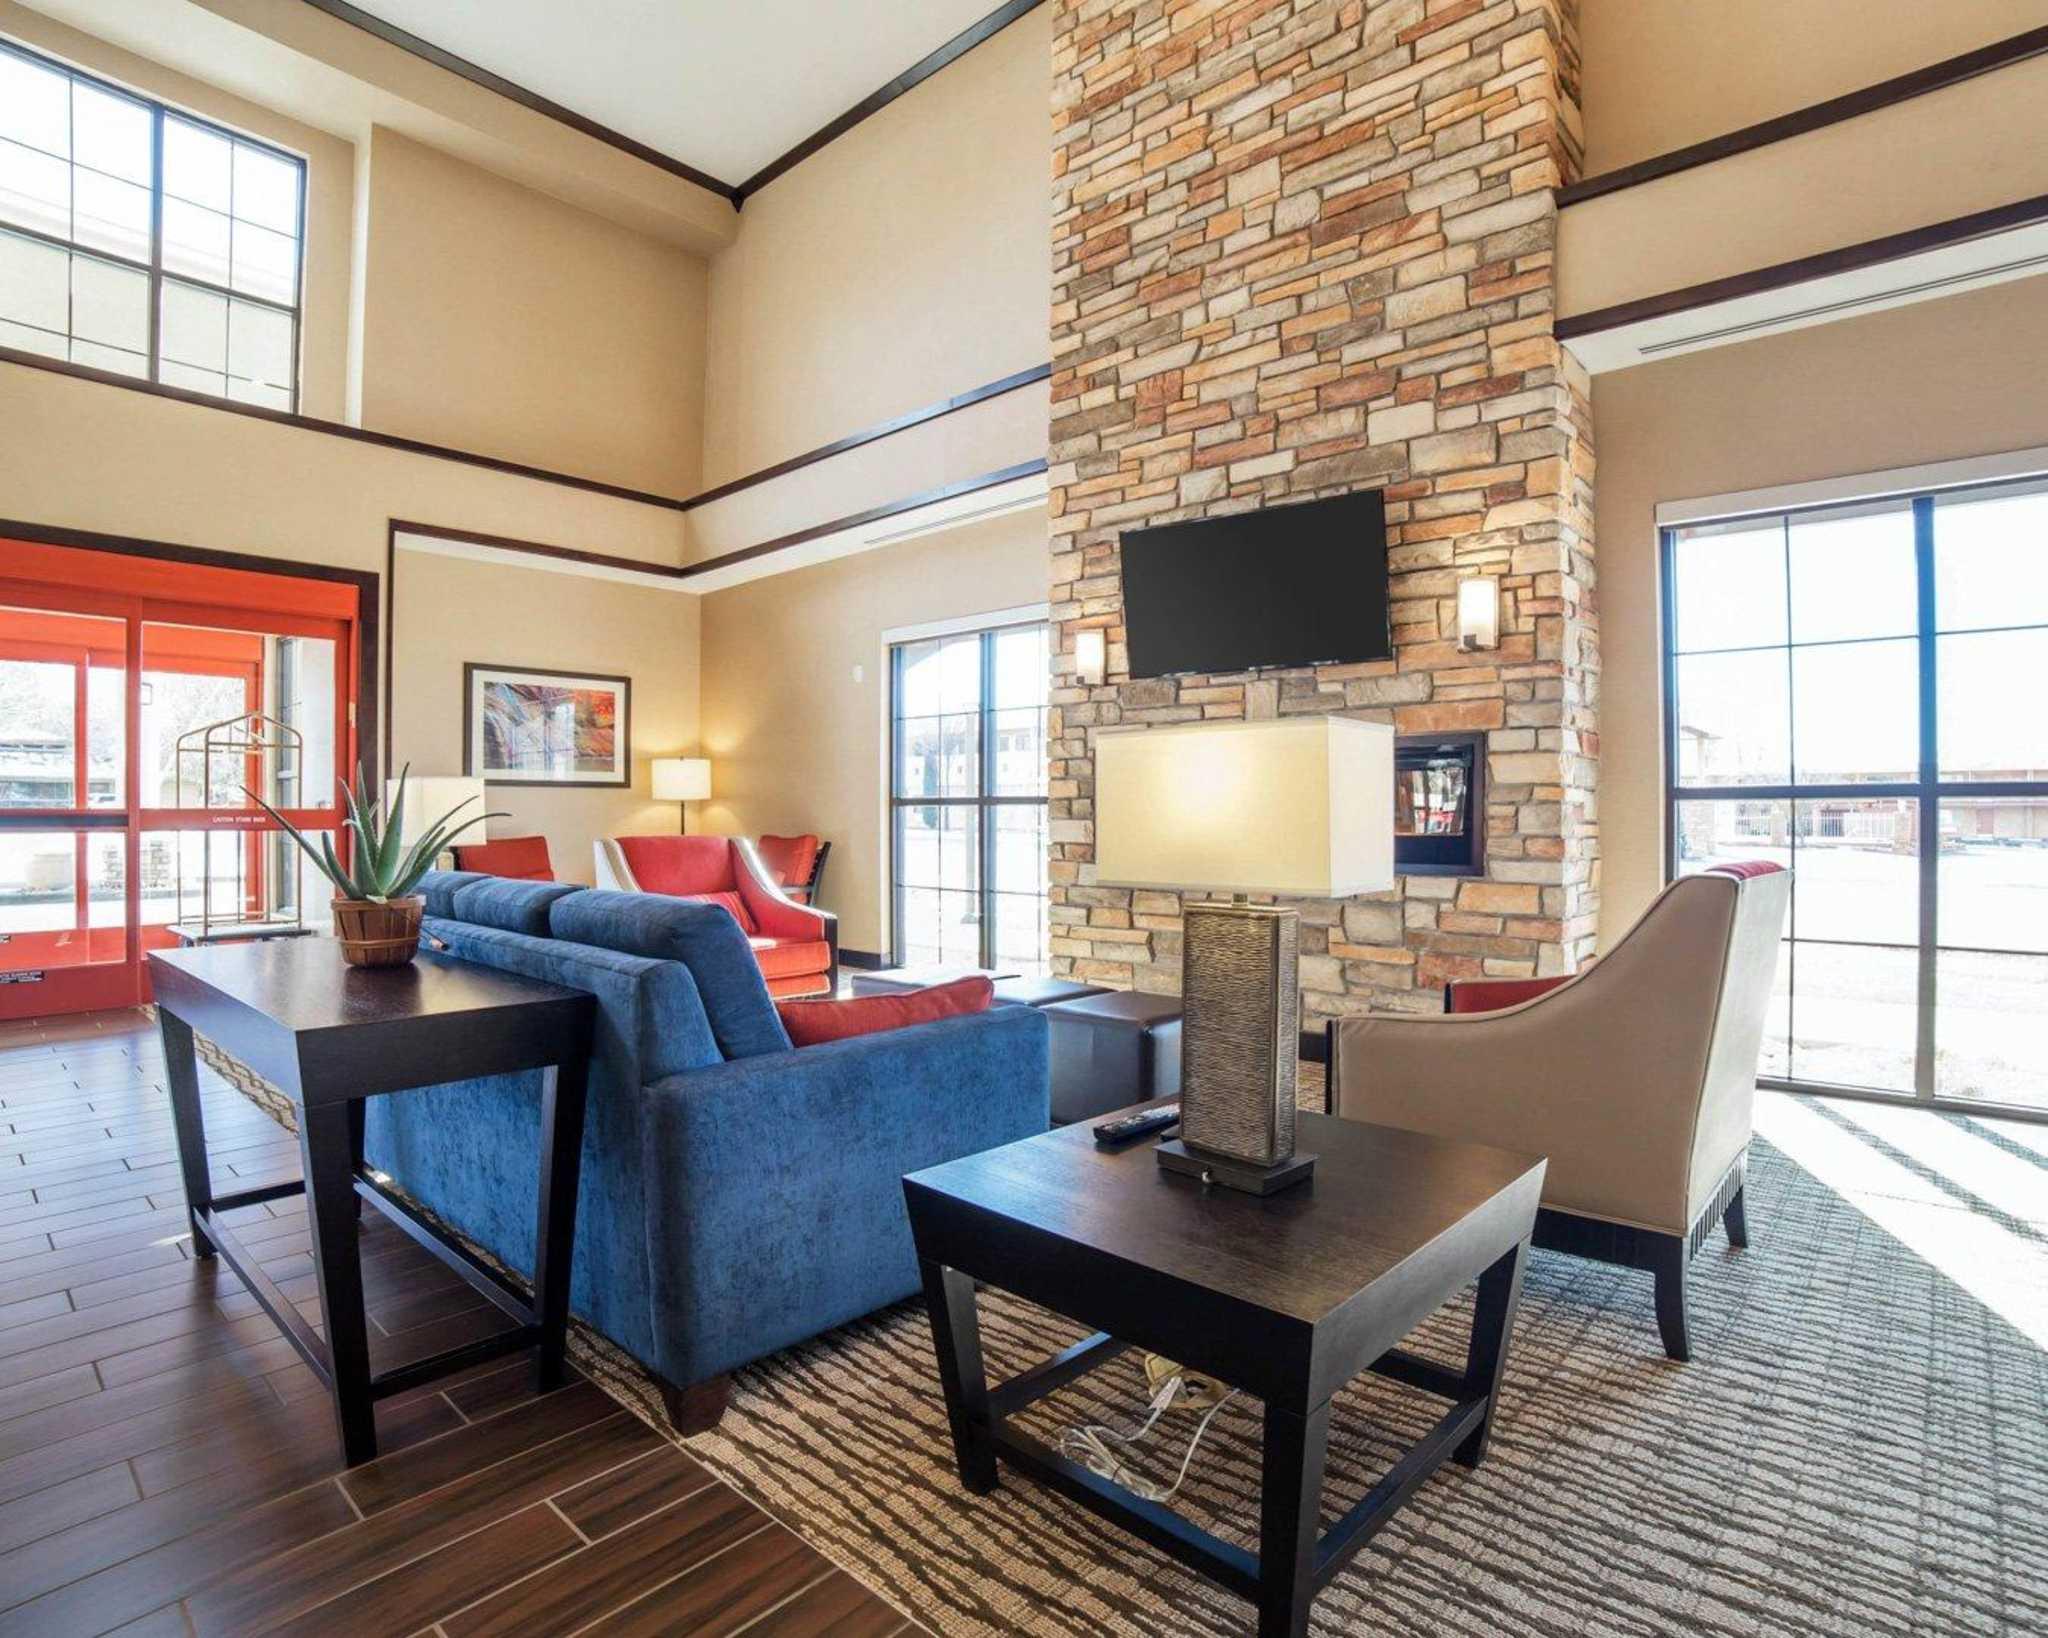 Comfort Suites image 4